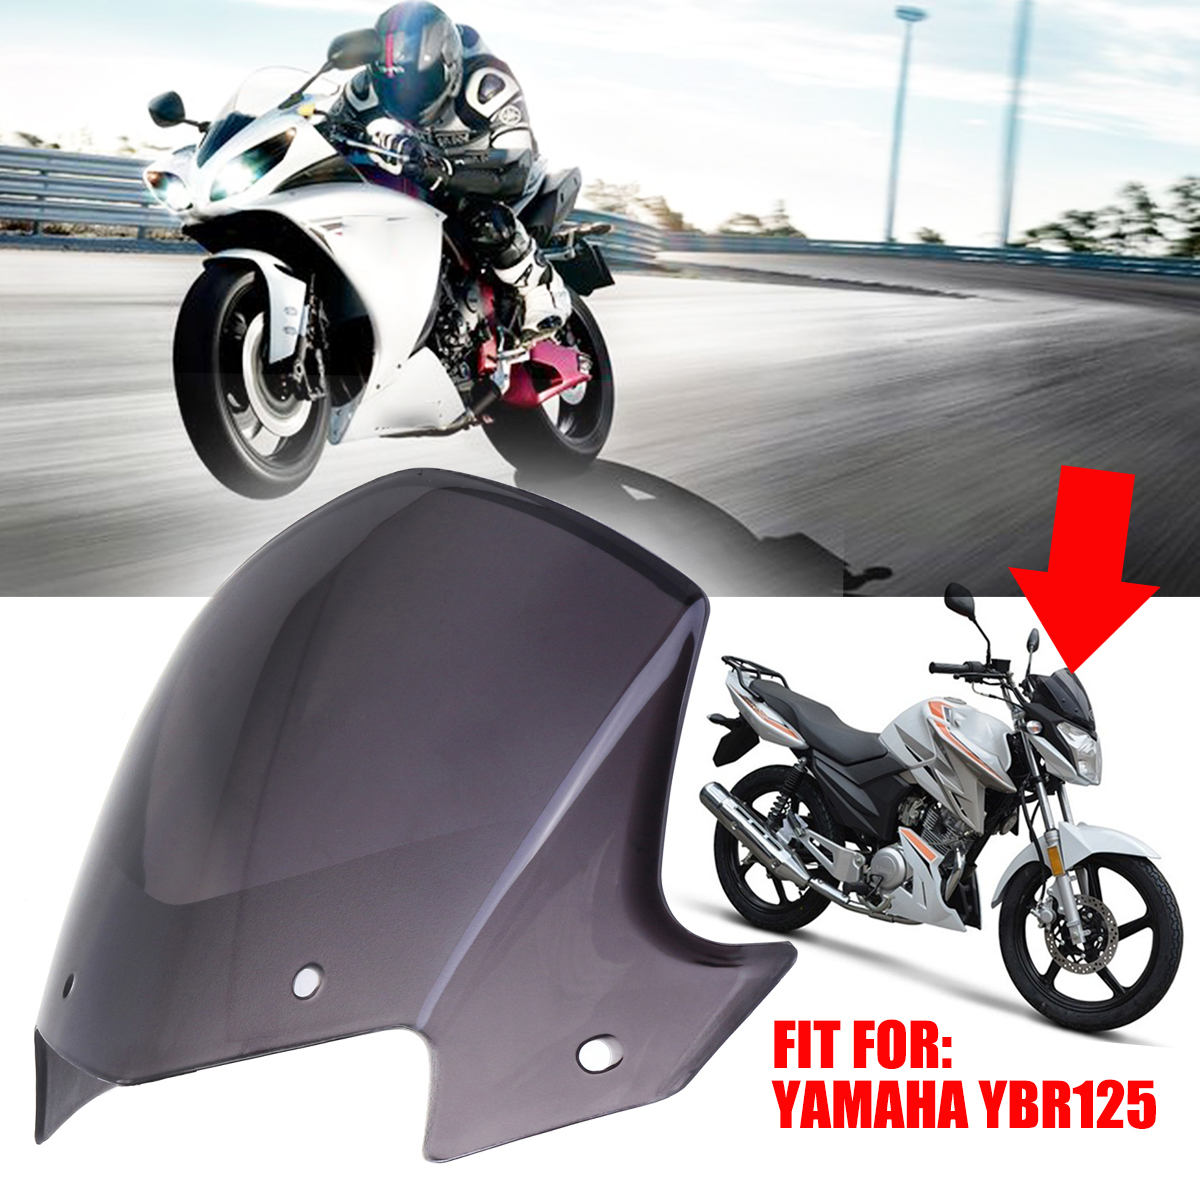 For Yamaha YBR 125 Headlight Fairing Wind Shield Screen With Accessories Transparent Brown Motor Windshield Screen 2014-2017